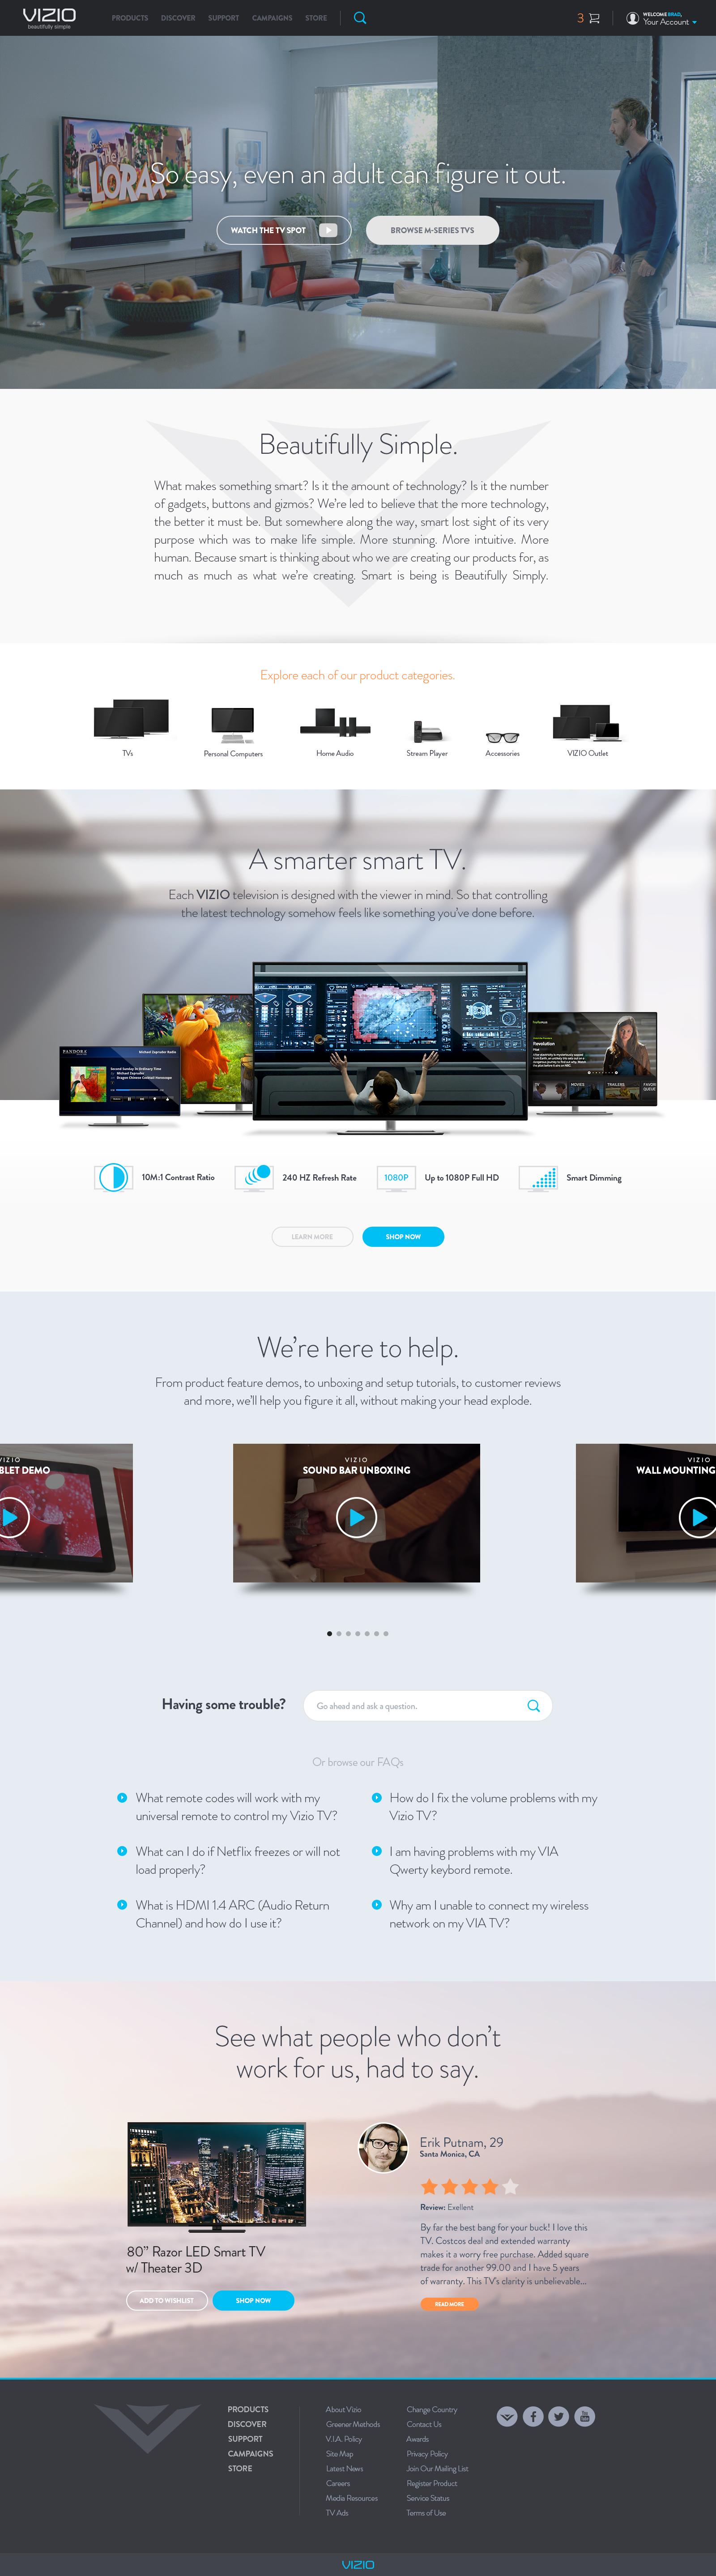 Vizio Home Fullpixels Jpg By Brad Burke Interactive Design Web Design Inspiration Web Design